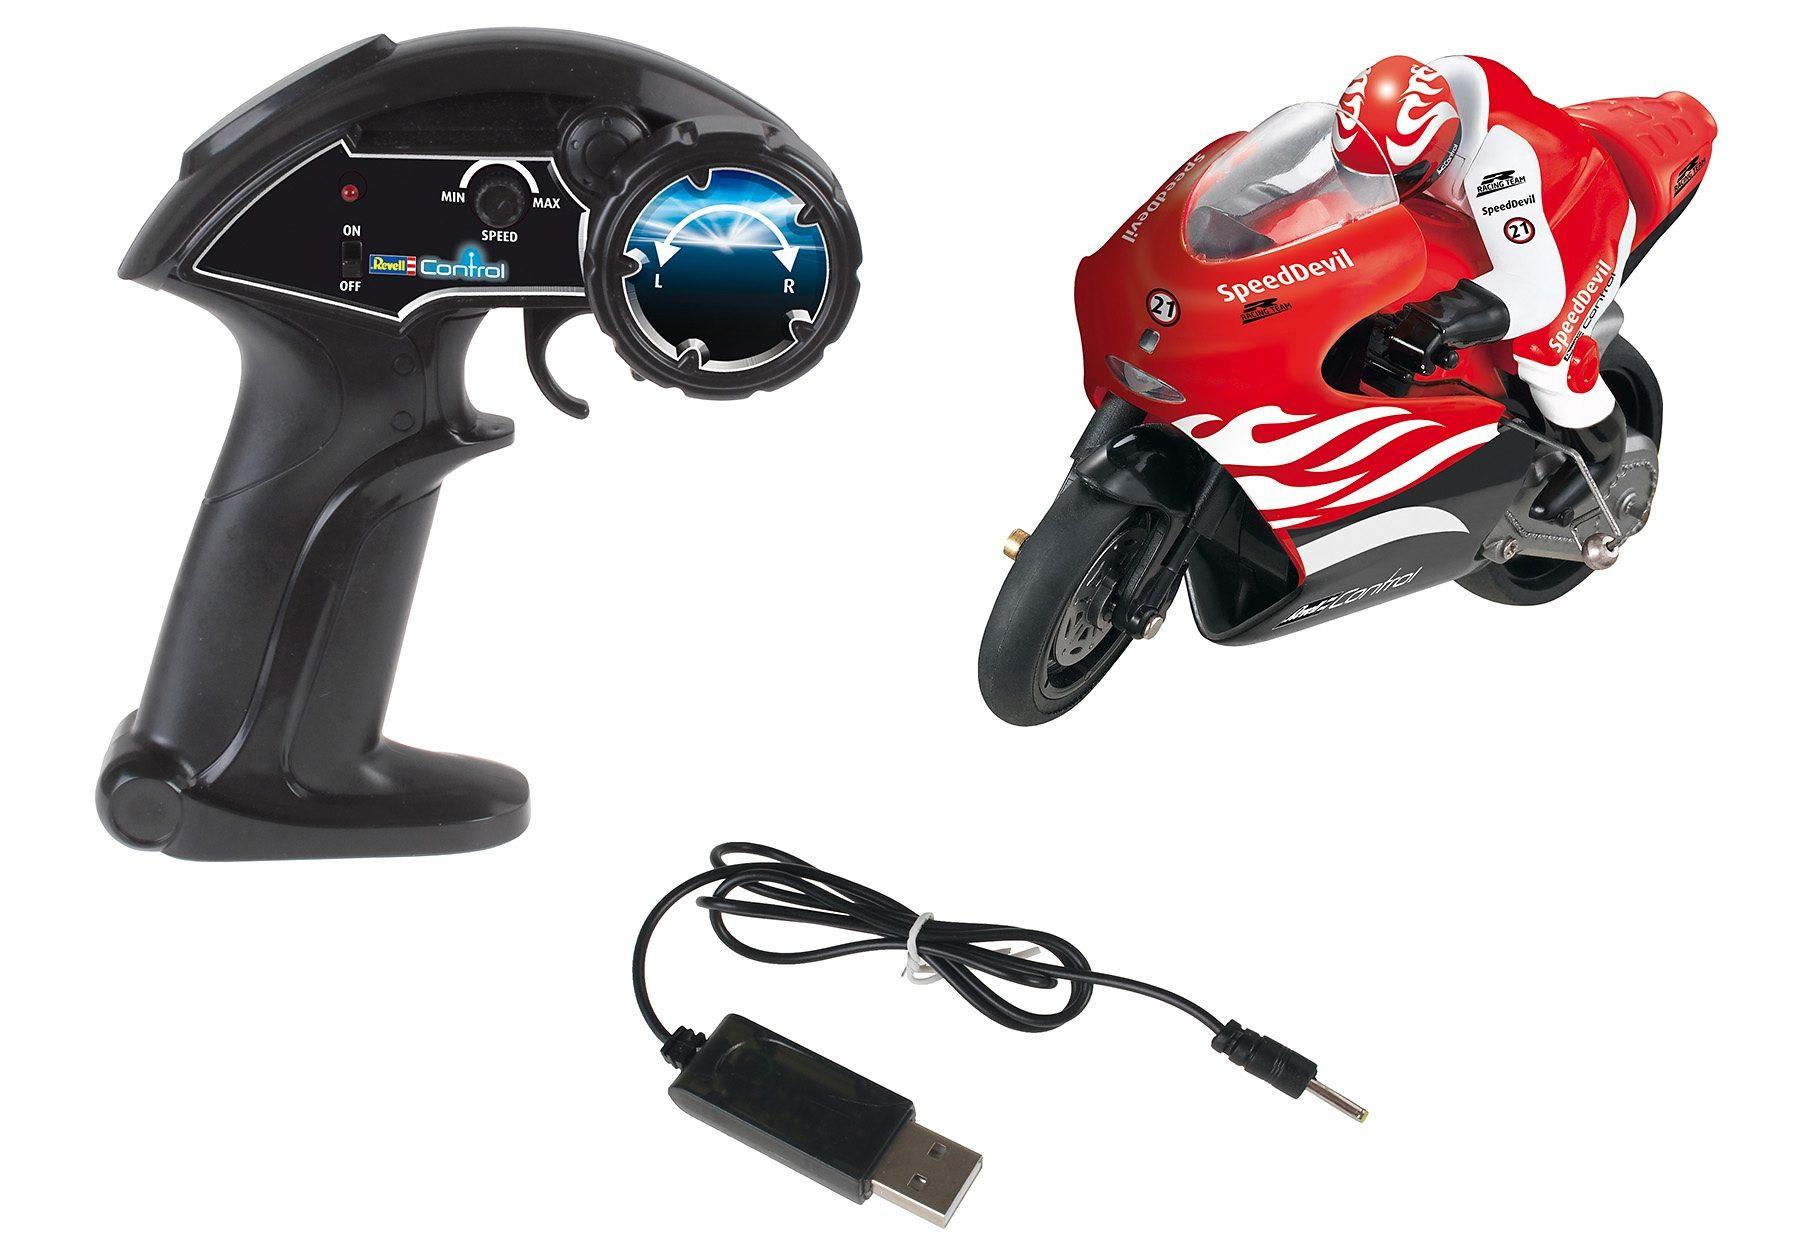 Revell® RC Motorrad, »Revell® Control Speed Devil II«